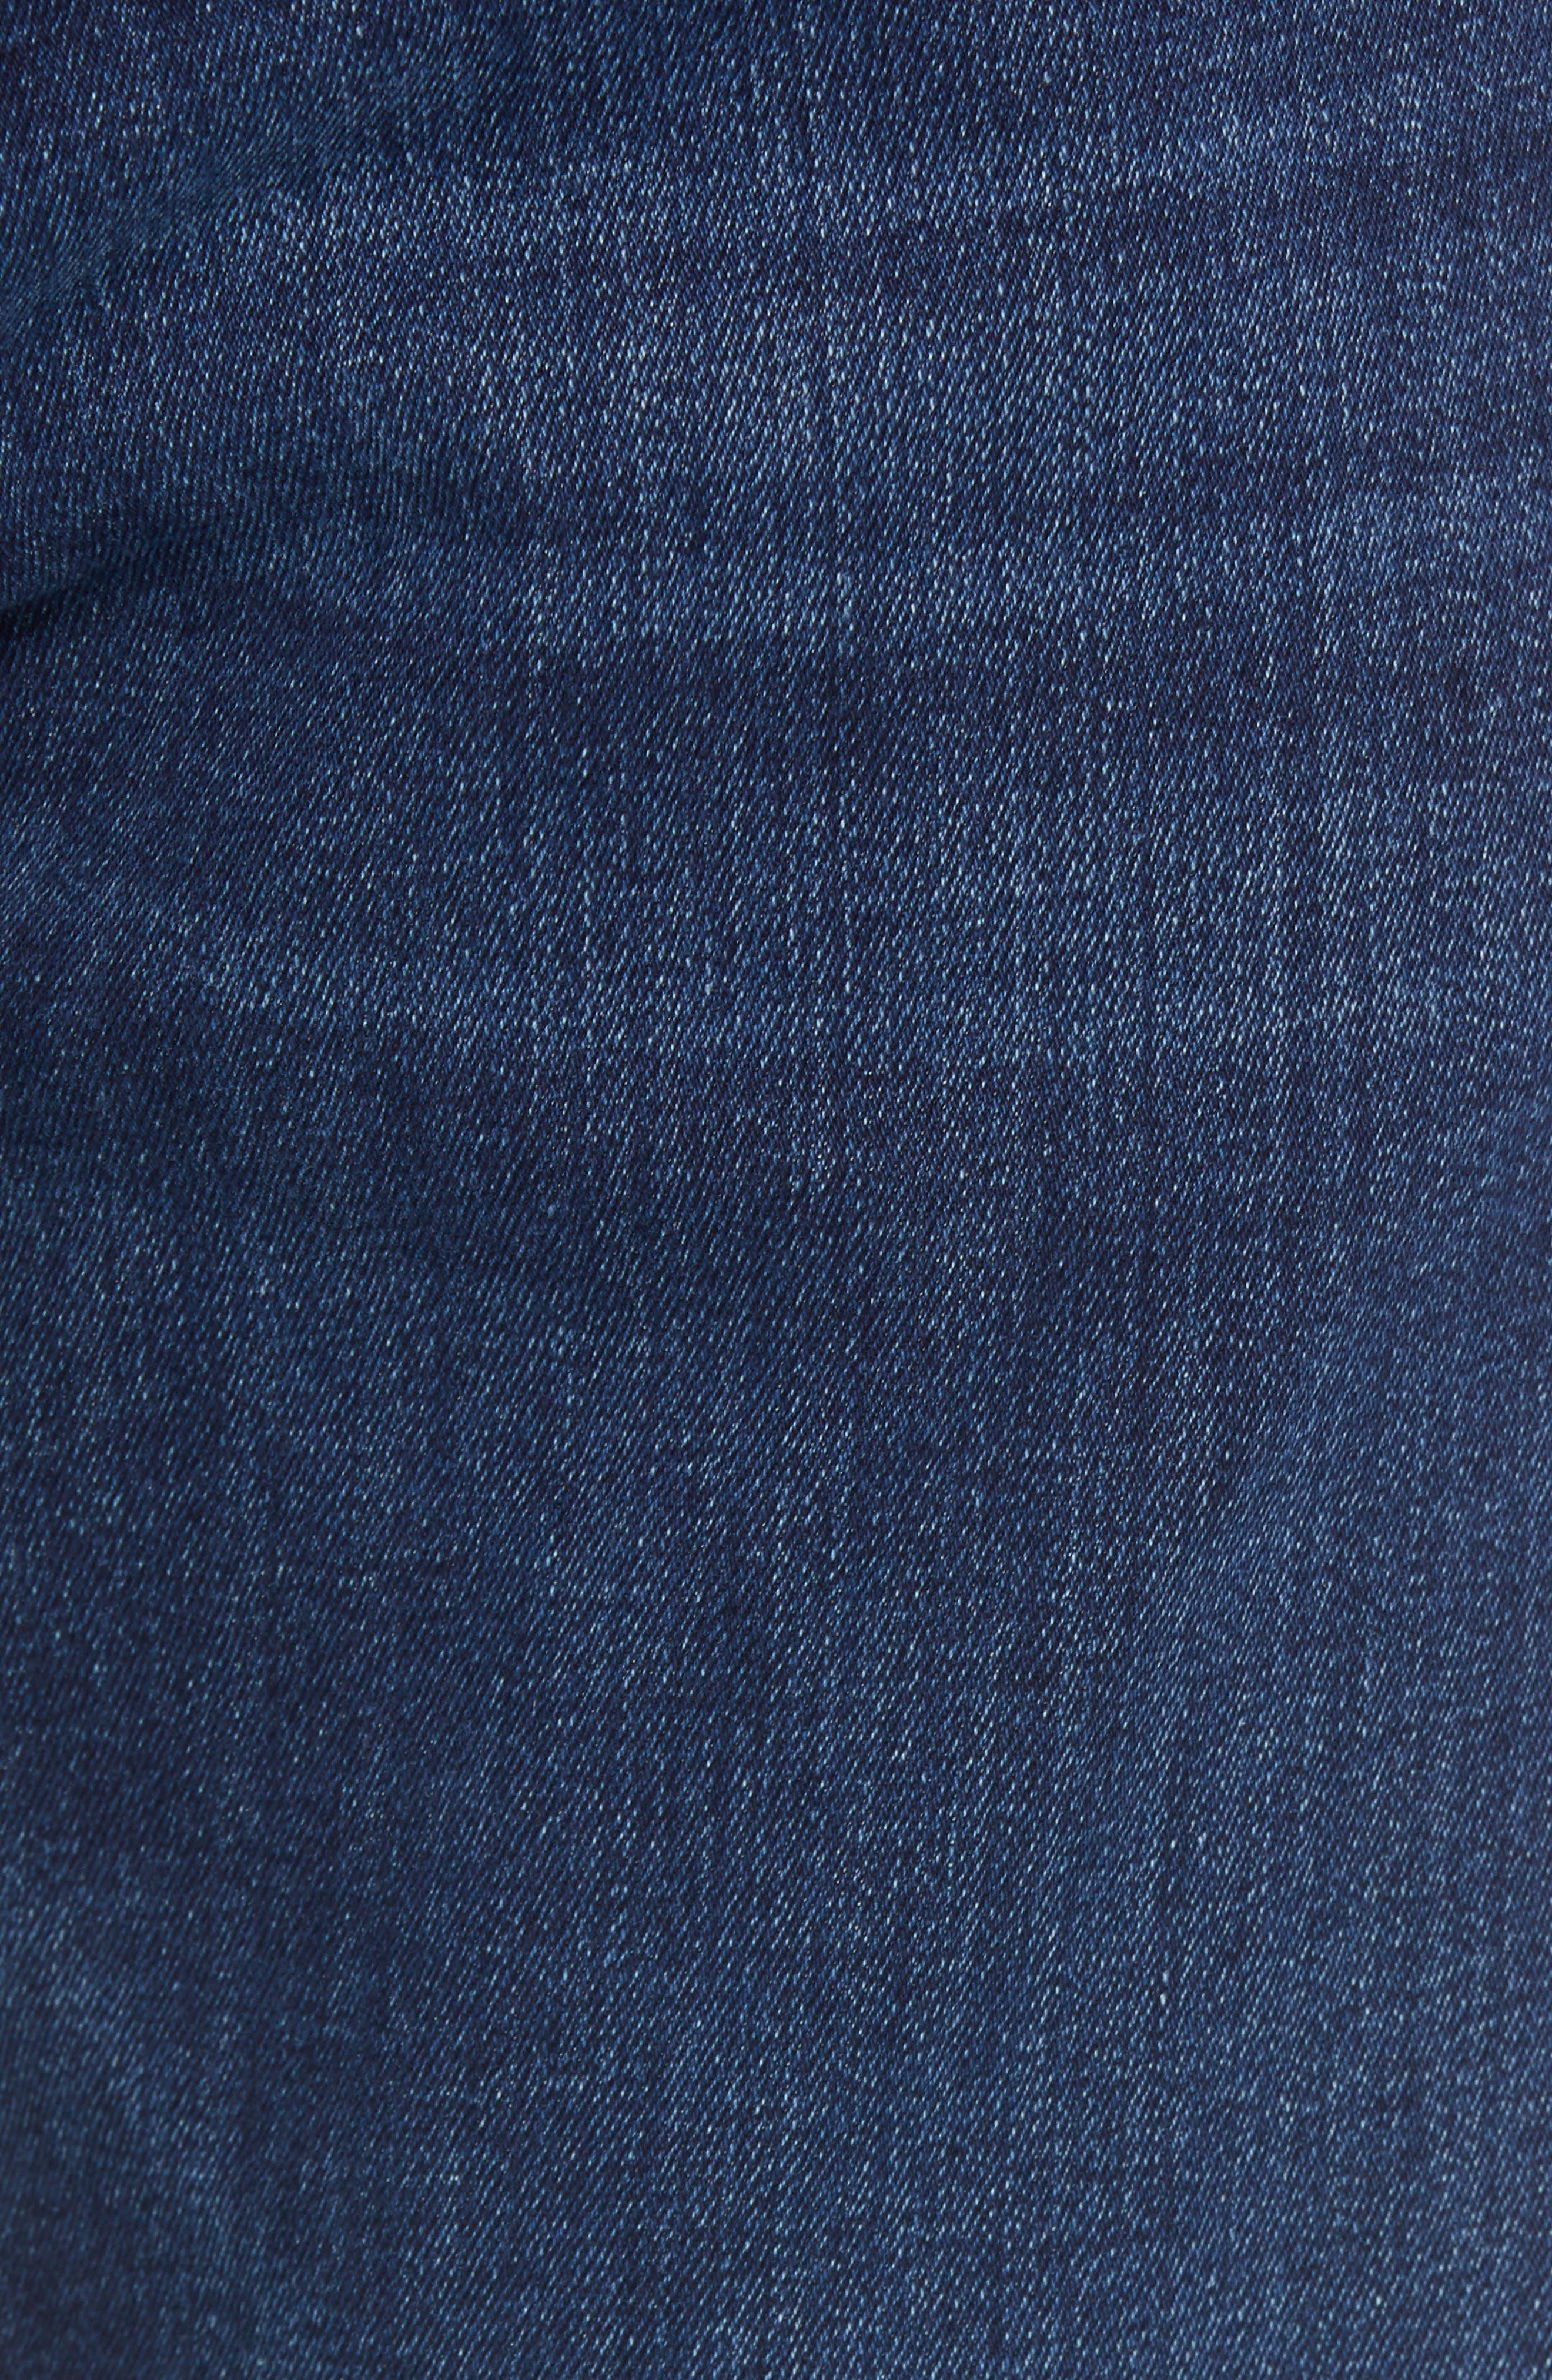 Zach Straight Leg Jeans,                             Alternate thumbnail 6, color,                             Dark Blue Williamsburg